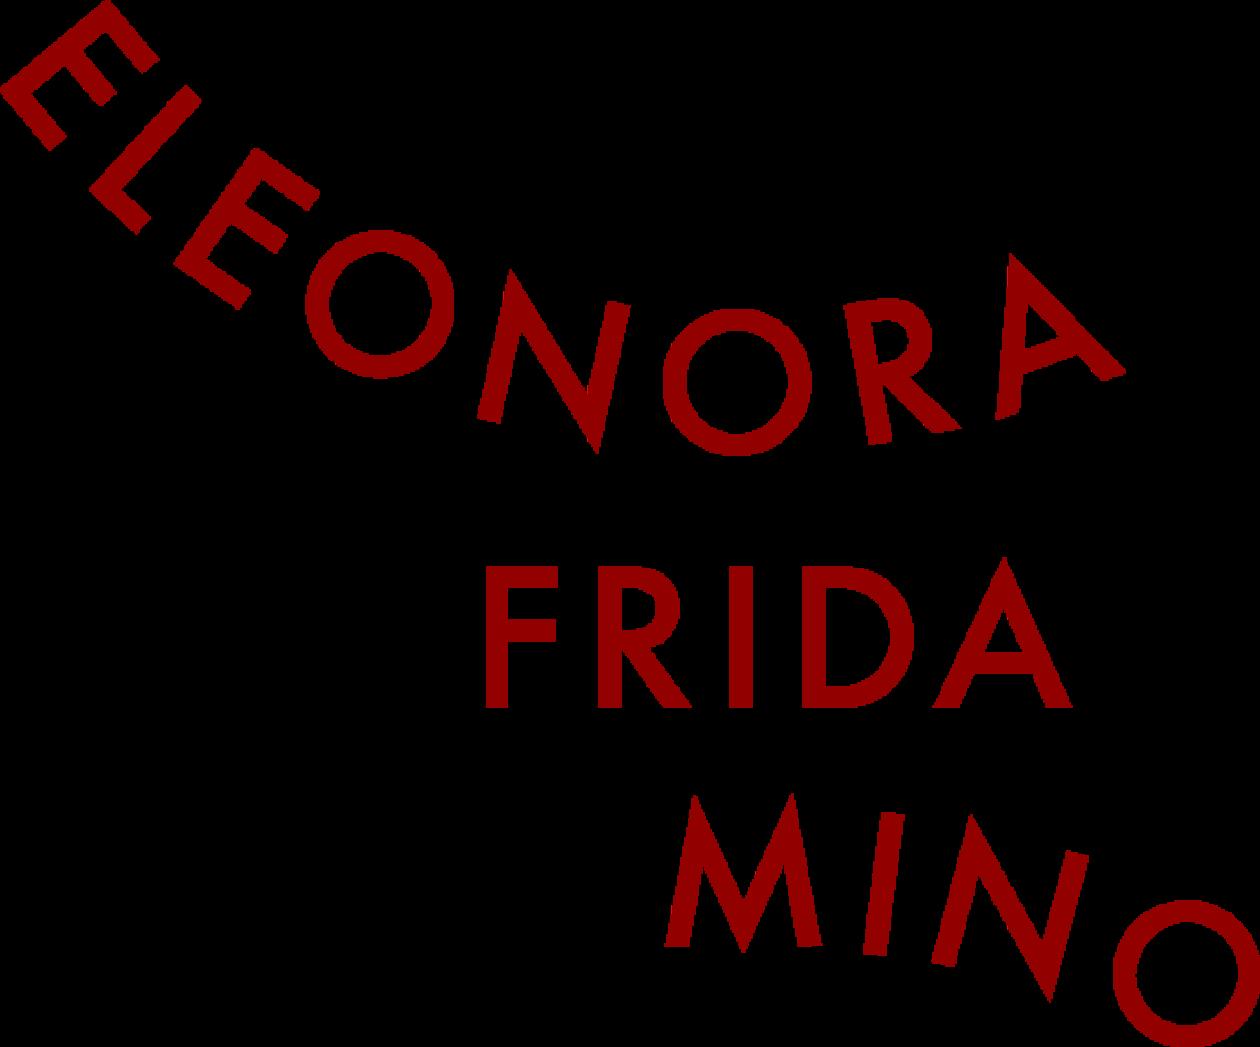 Eleonora Mino